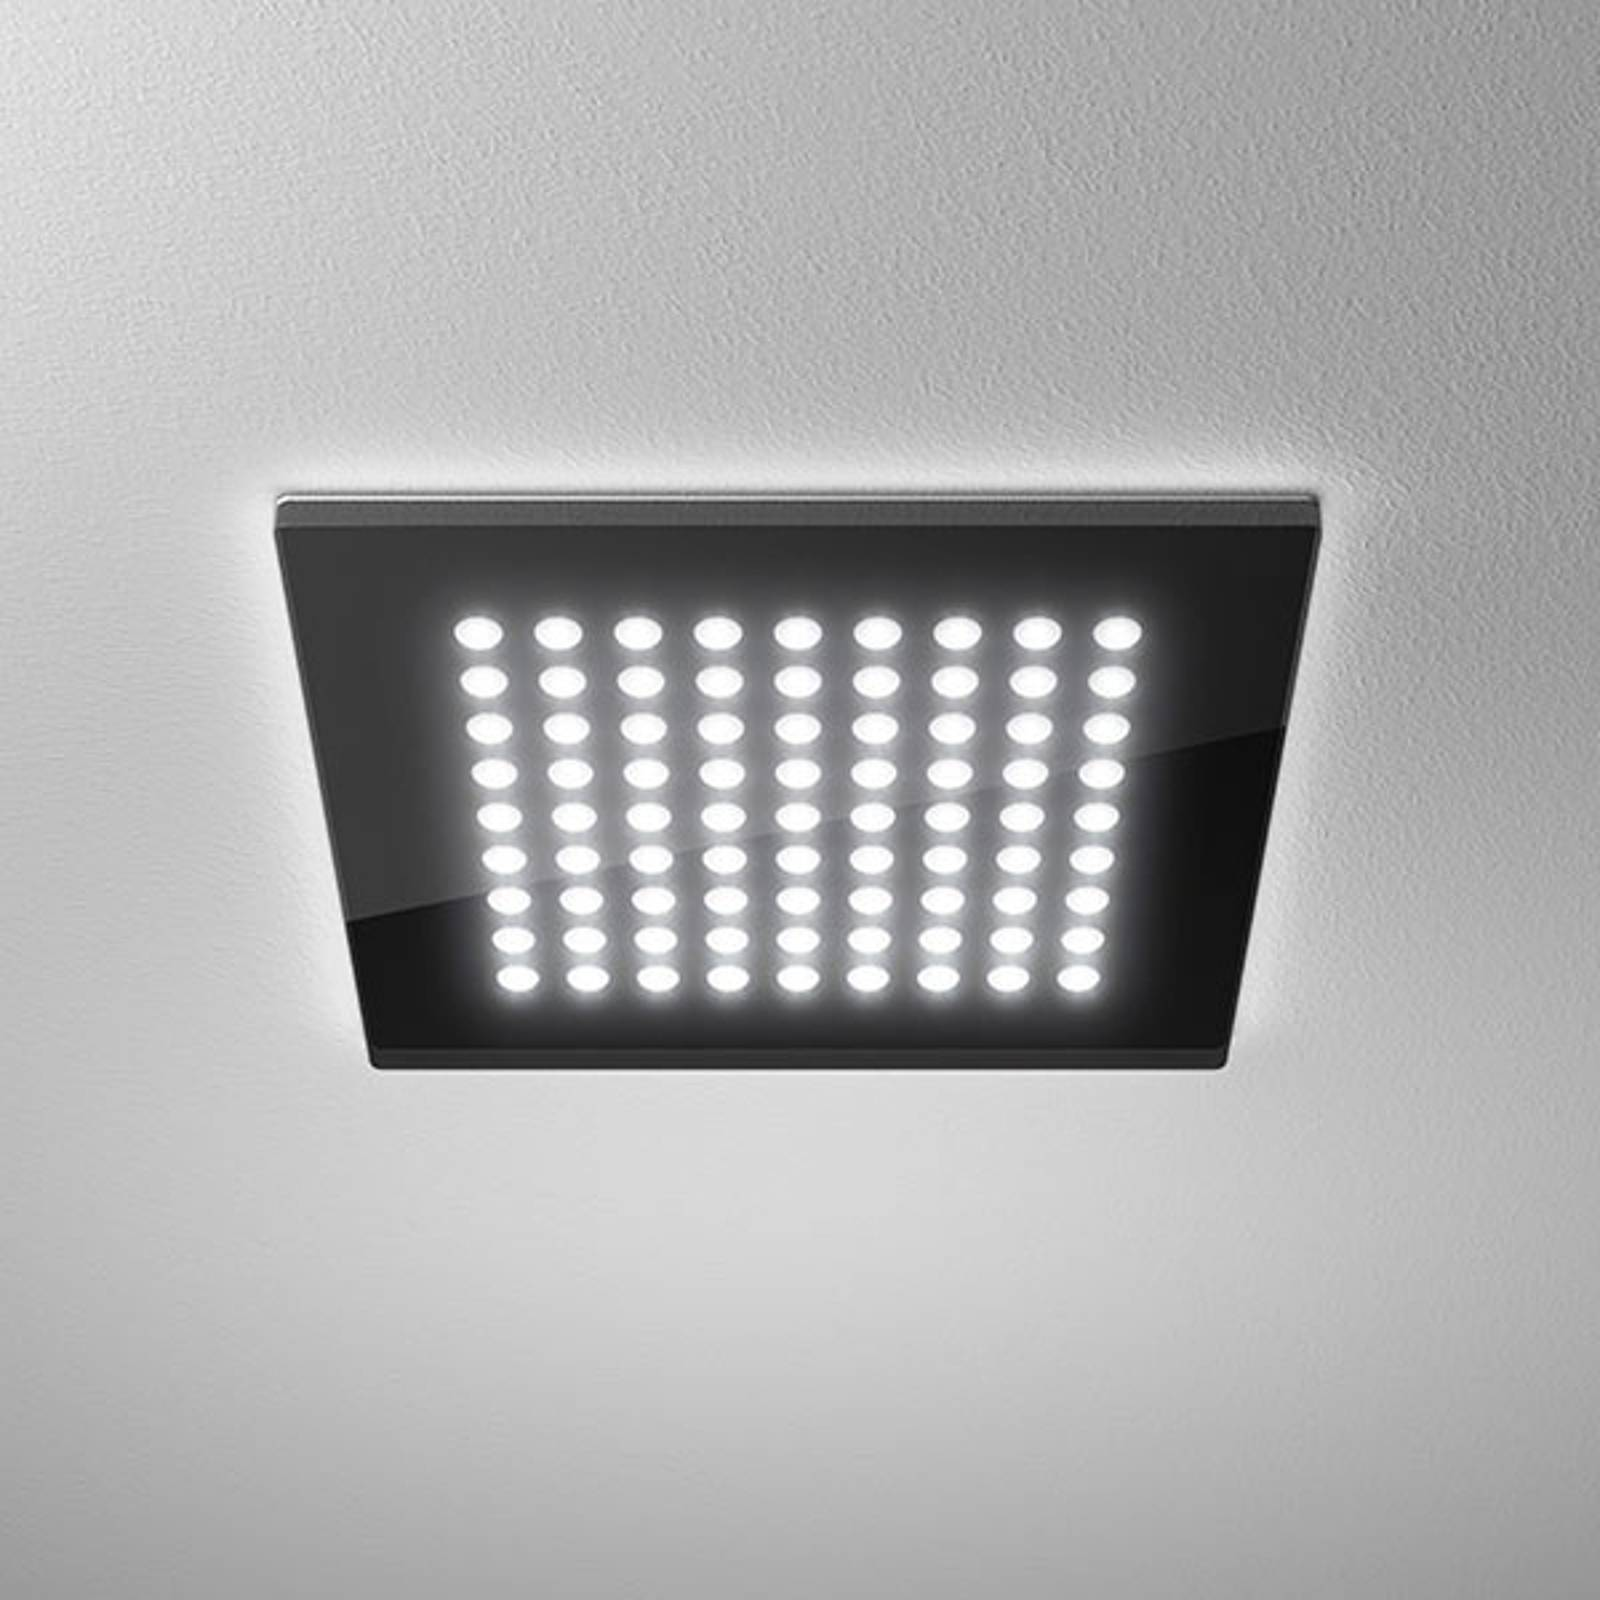 Downlight LED Domino Flat Square, 21 x 21cm, 18W